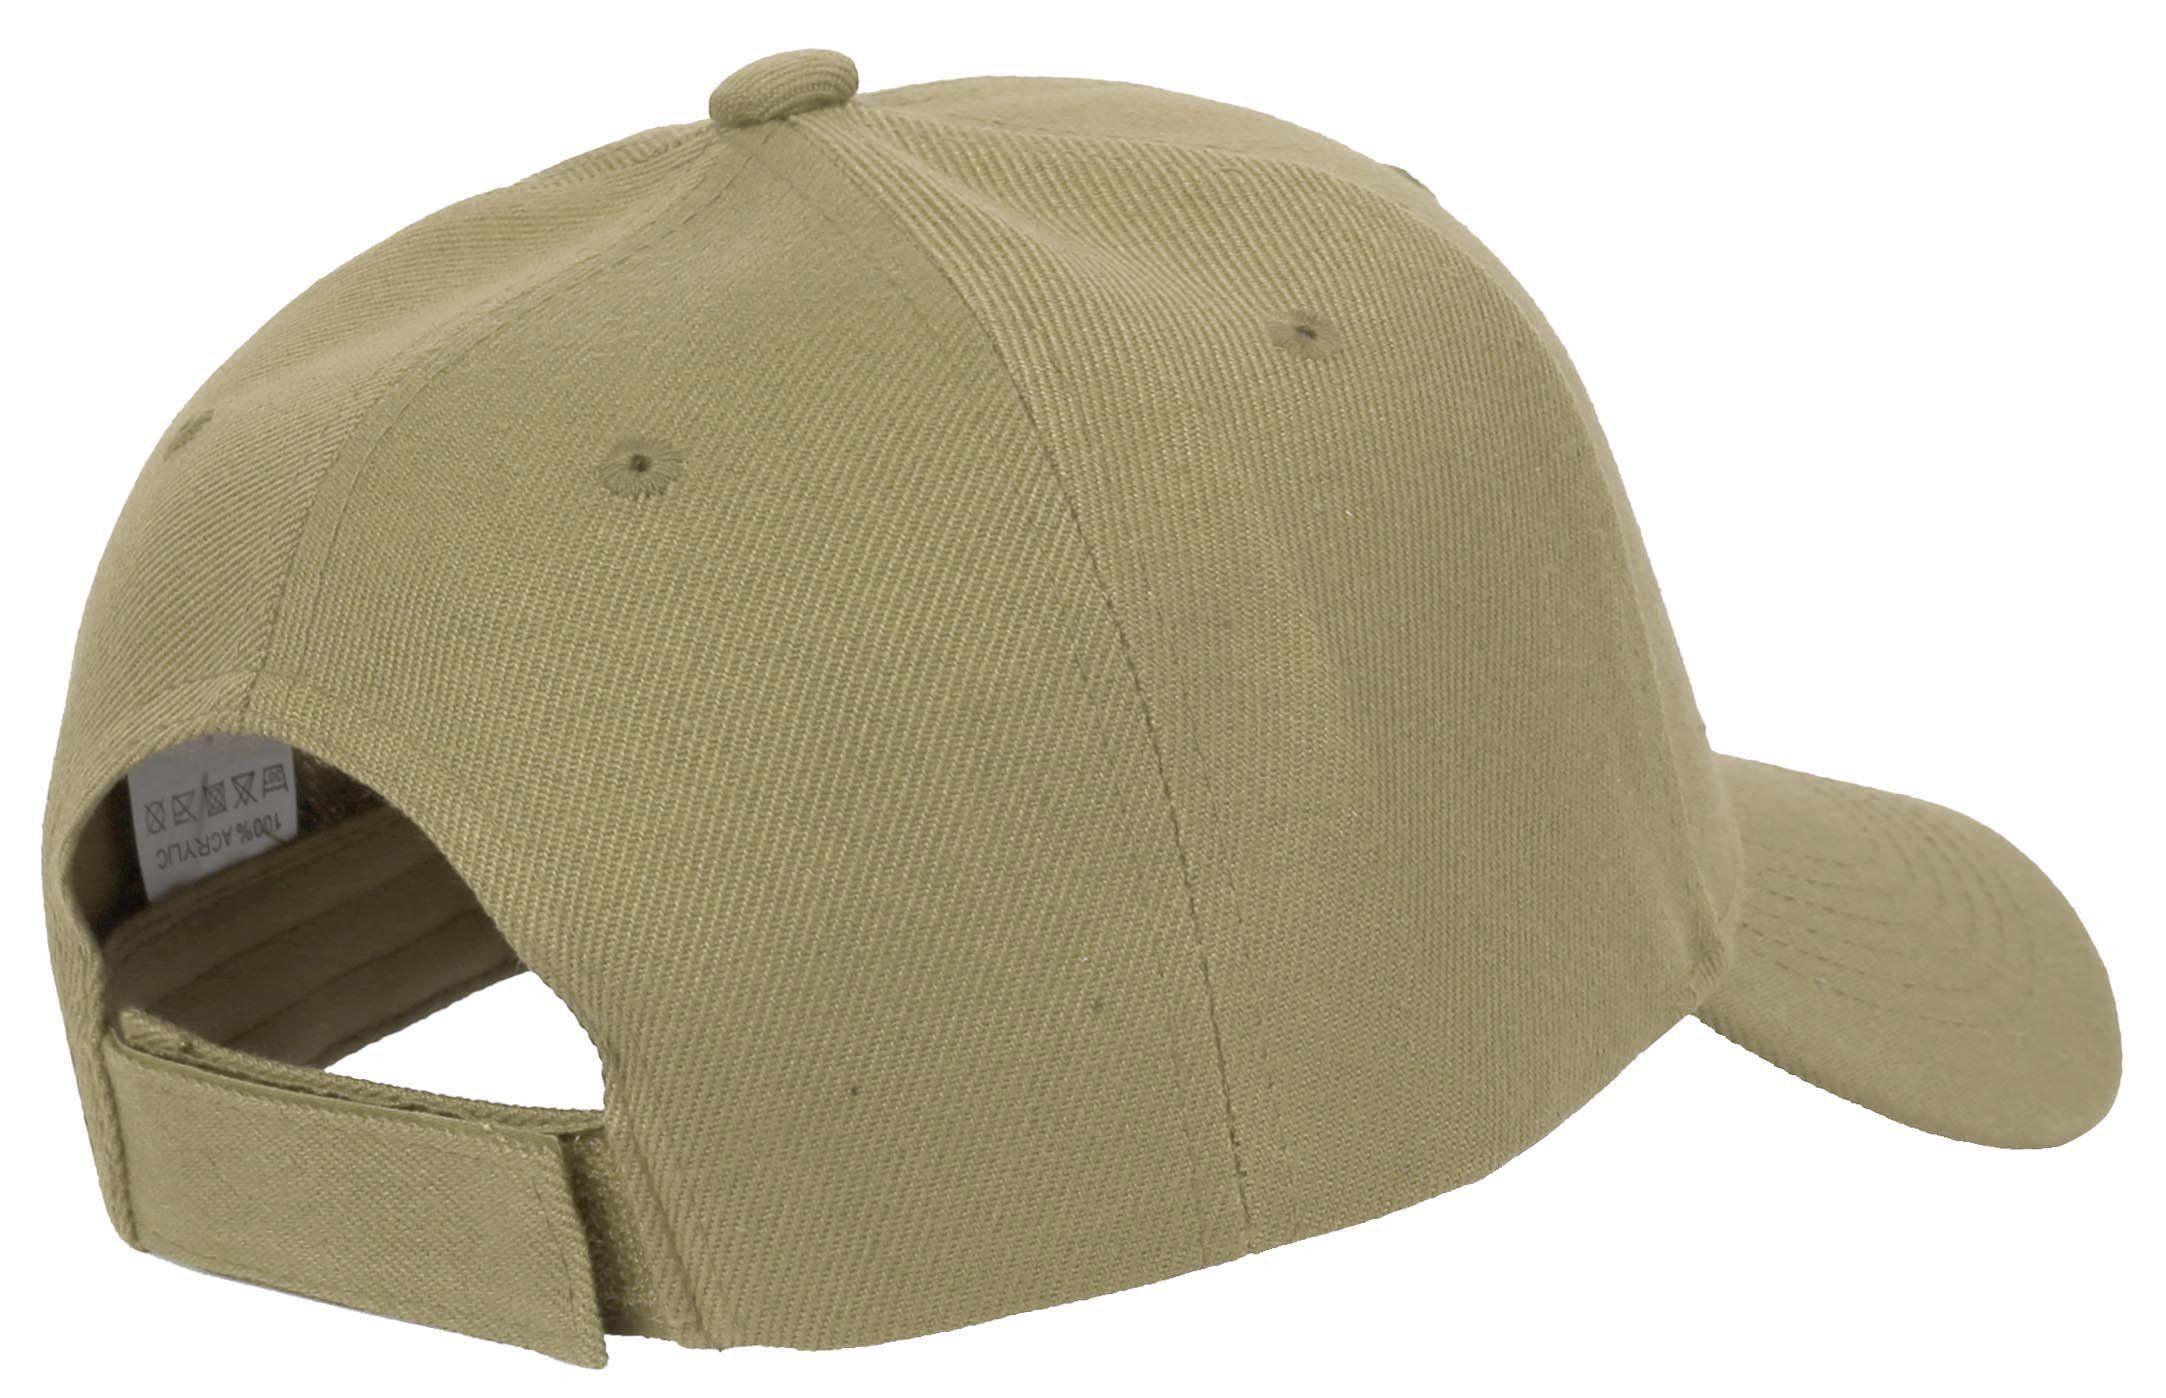 Solid Adjustable Velcro Baseball Cap